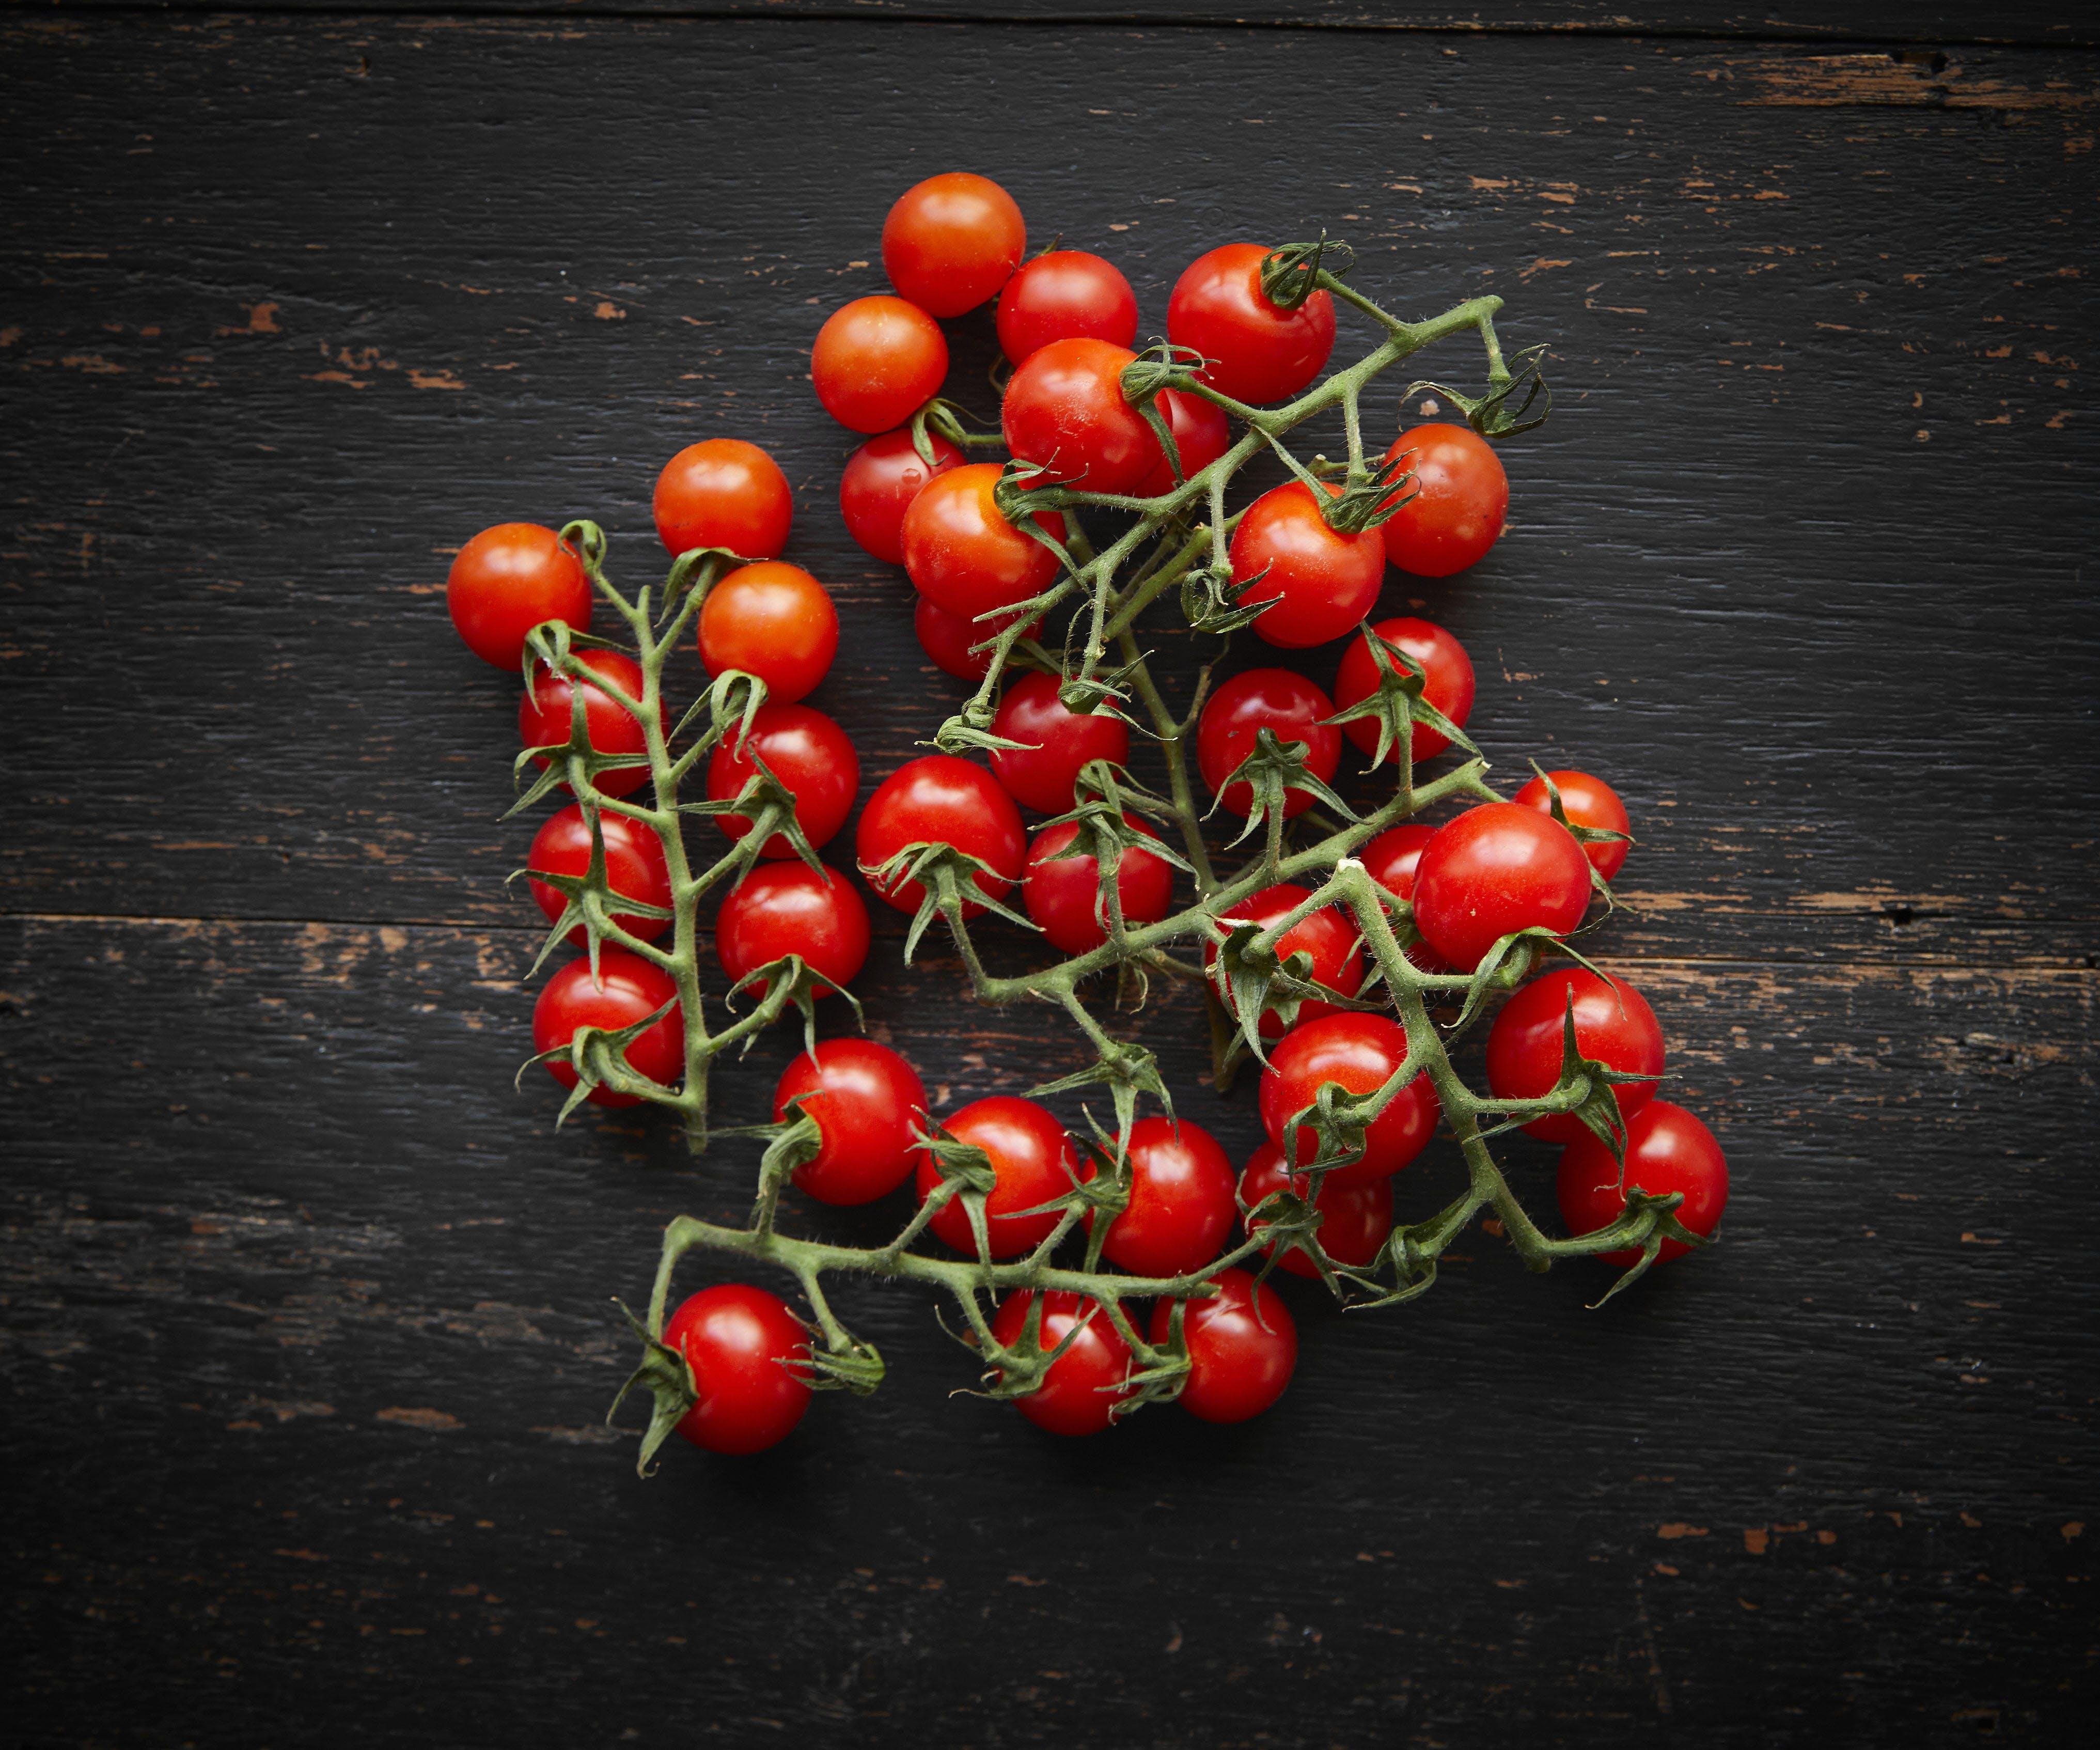 Tomatoes - Cherry Vine